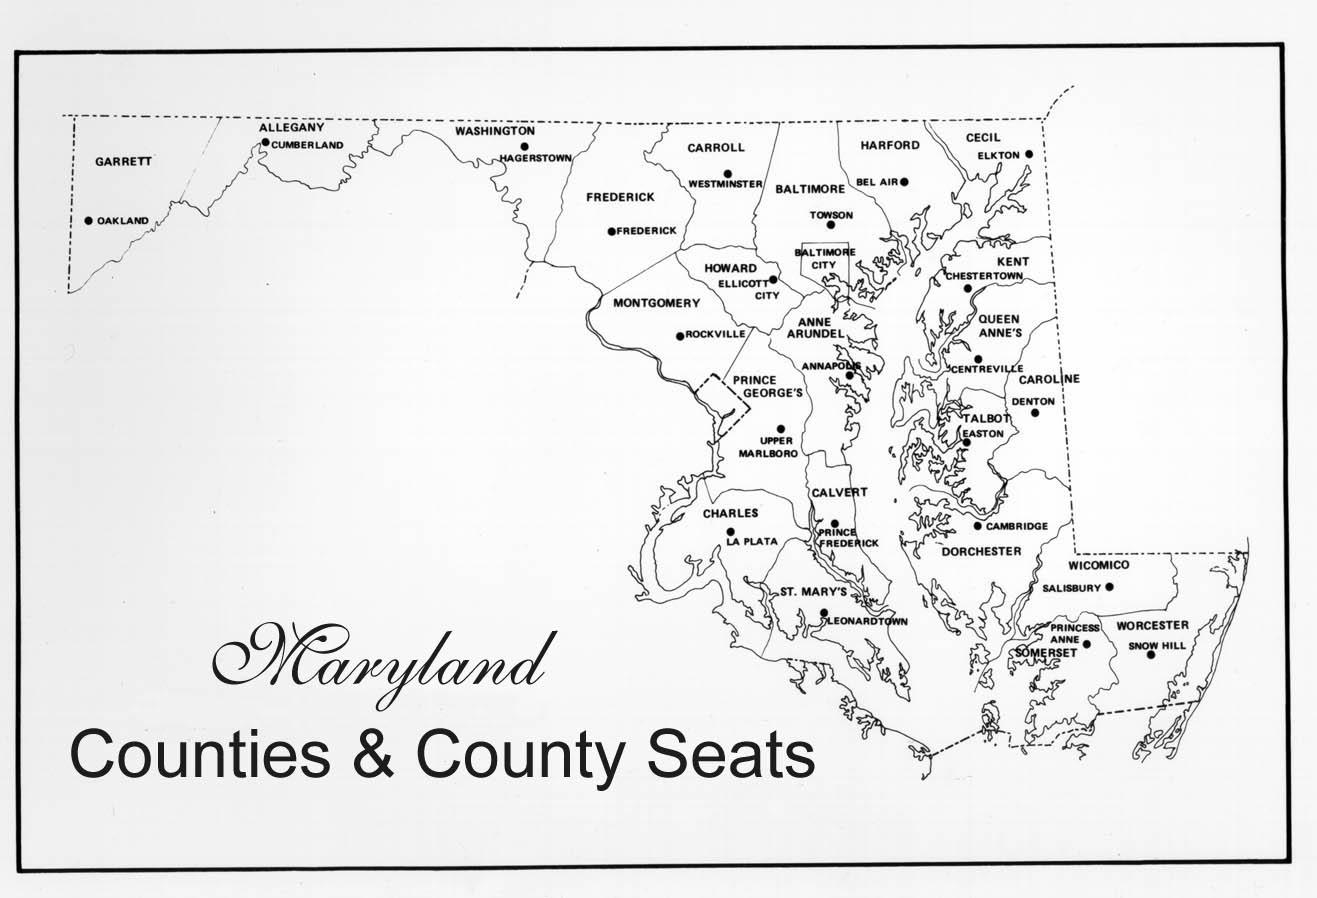 Beautiful Maryland Counties Map Photos - Printable Map - New ...